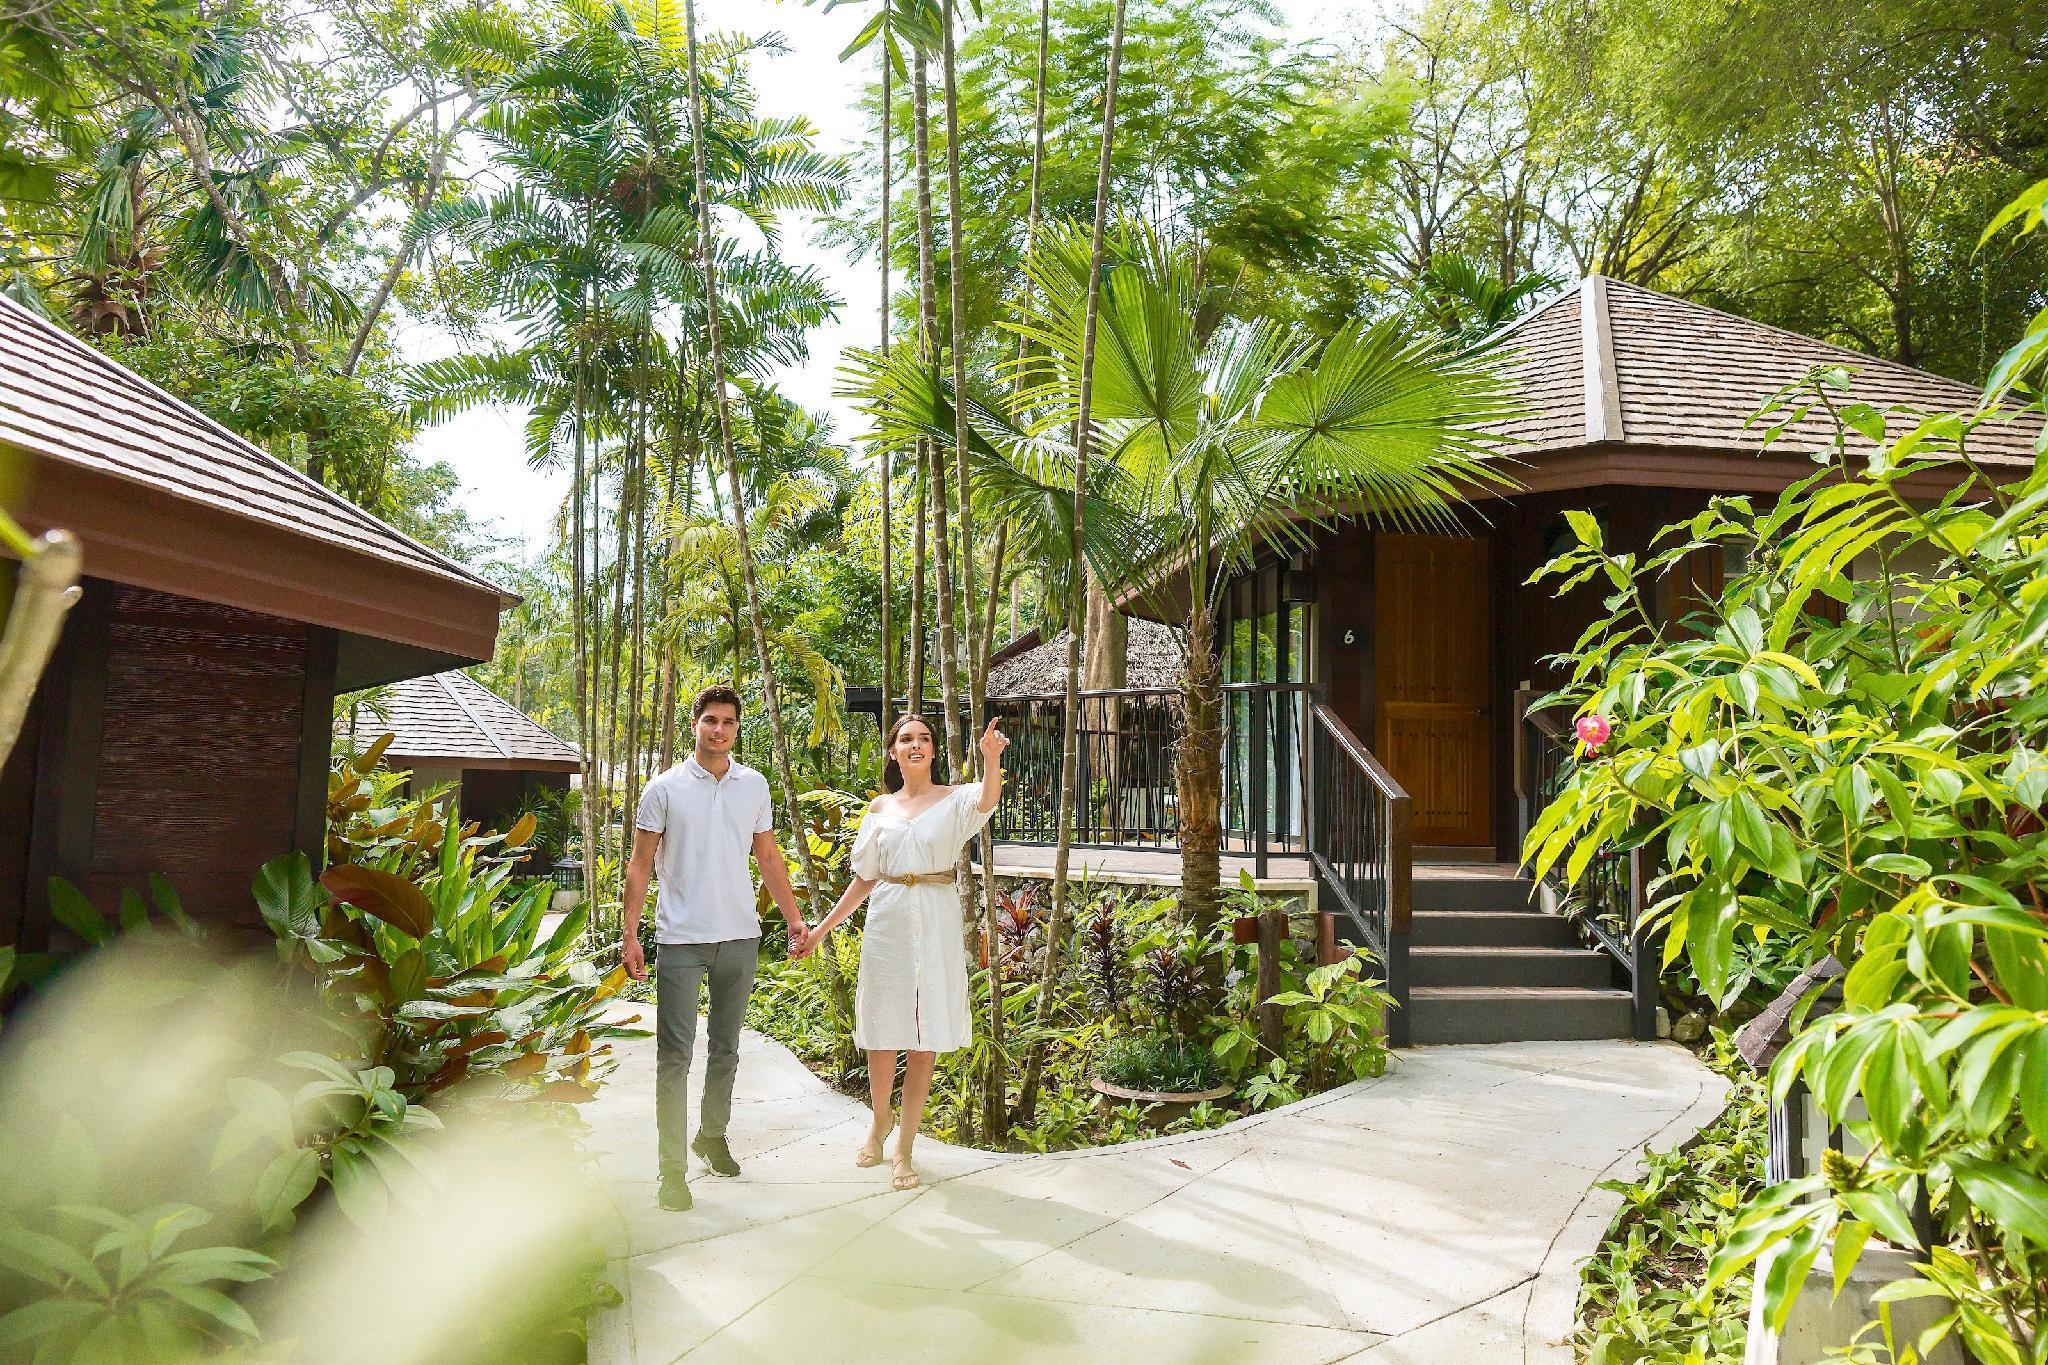 River Kwai Resotel Resort ริเวอร์แคว รีโซเทล รีสอร์ท